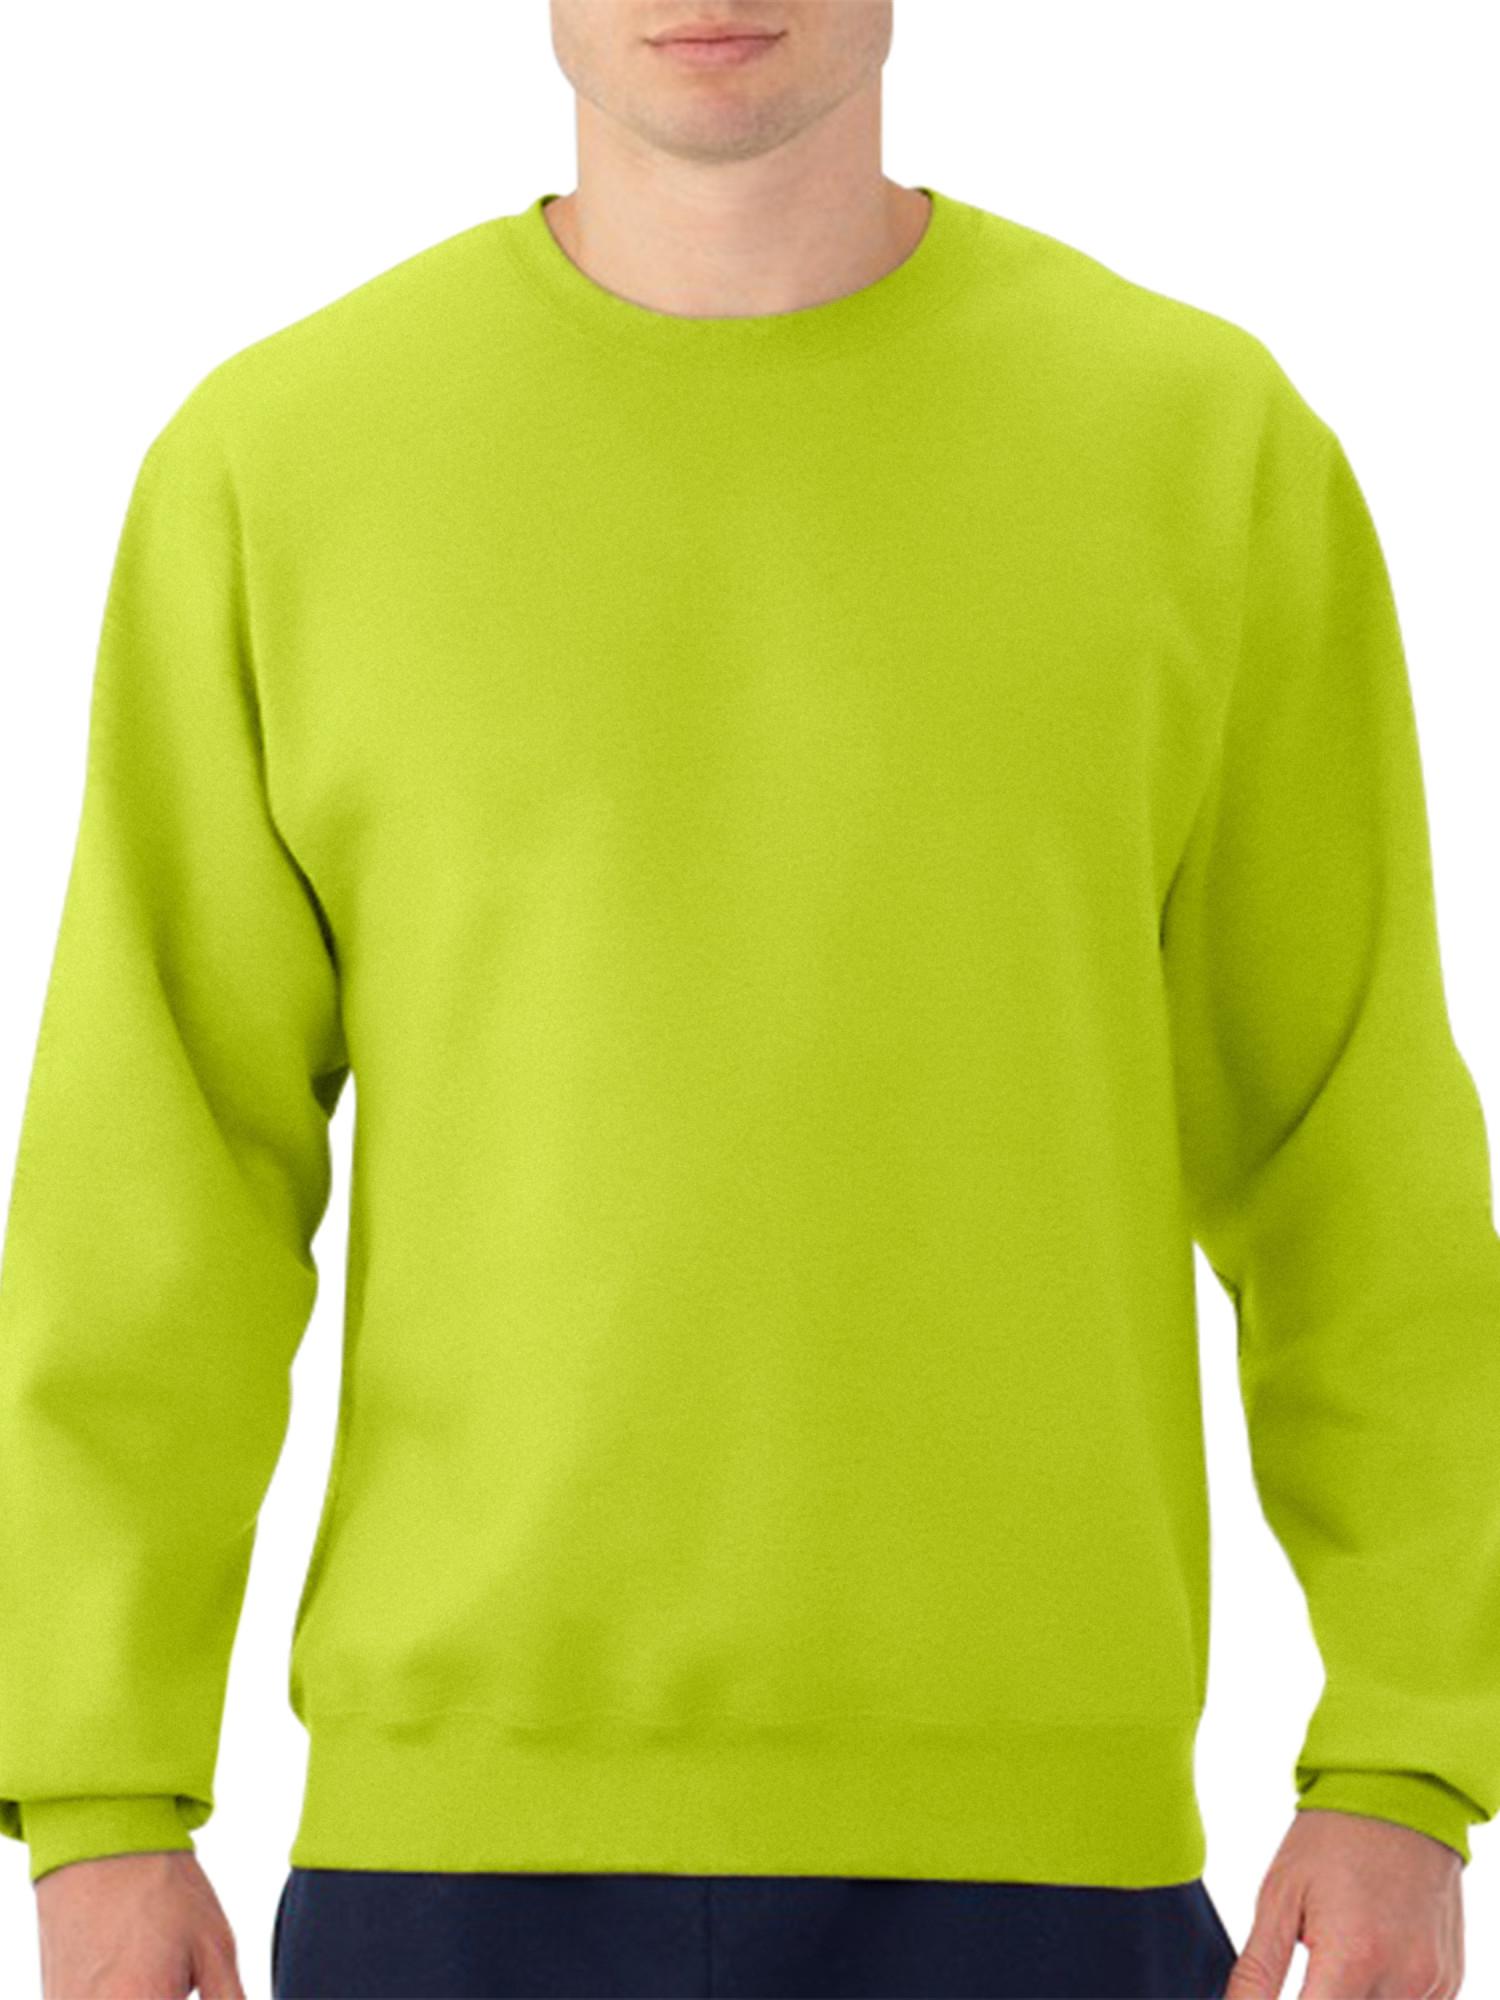 Fruit of the Loom Big Men's Dual Defense EverSoft Crew Sweatshirt